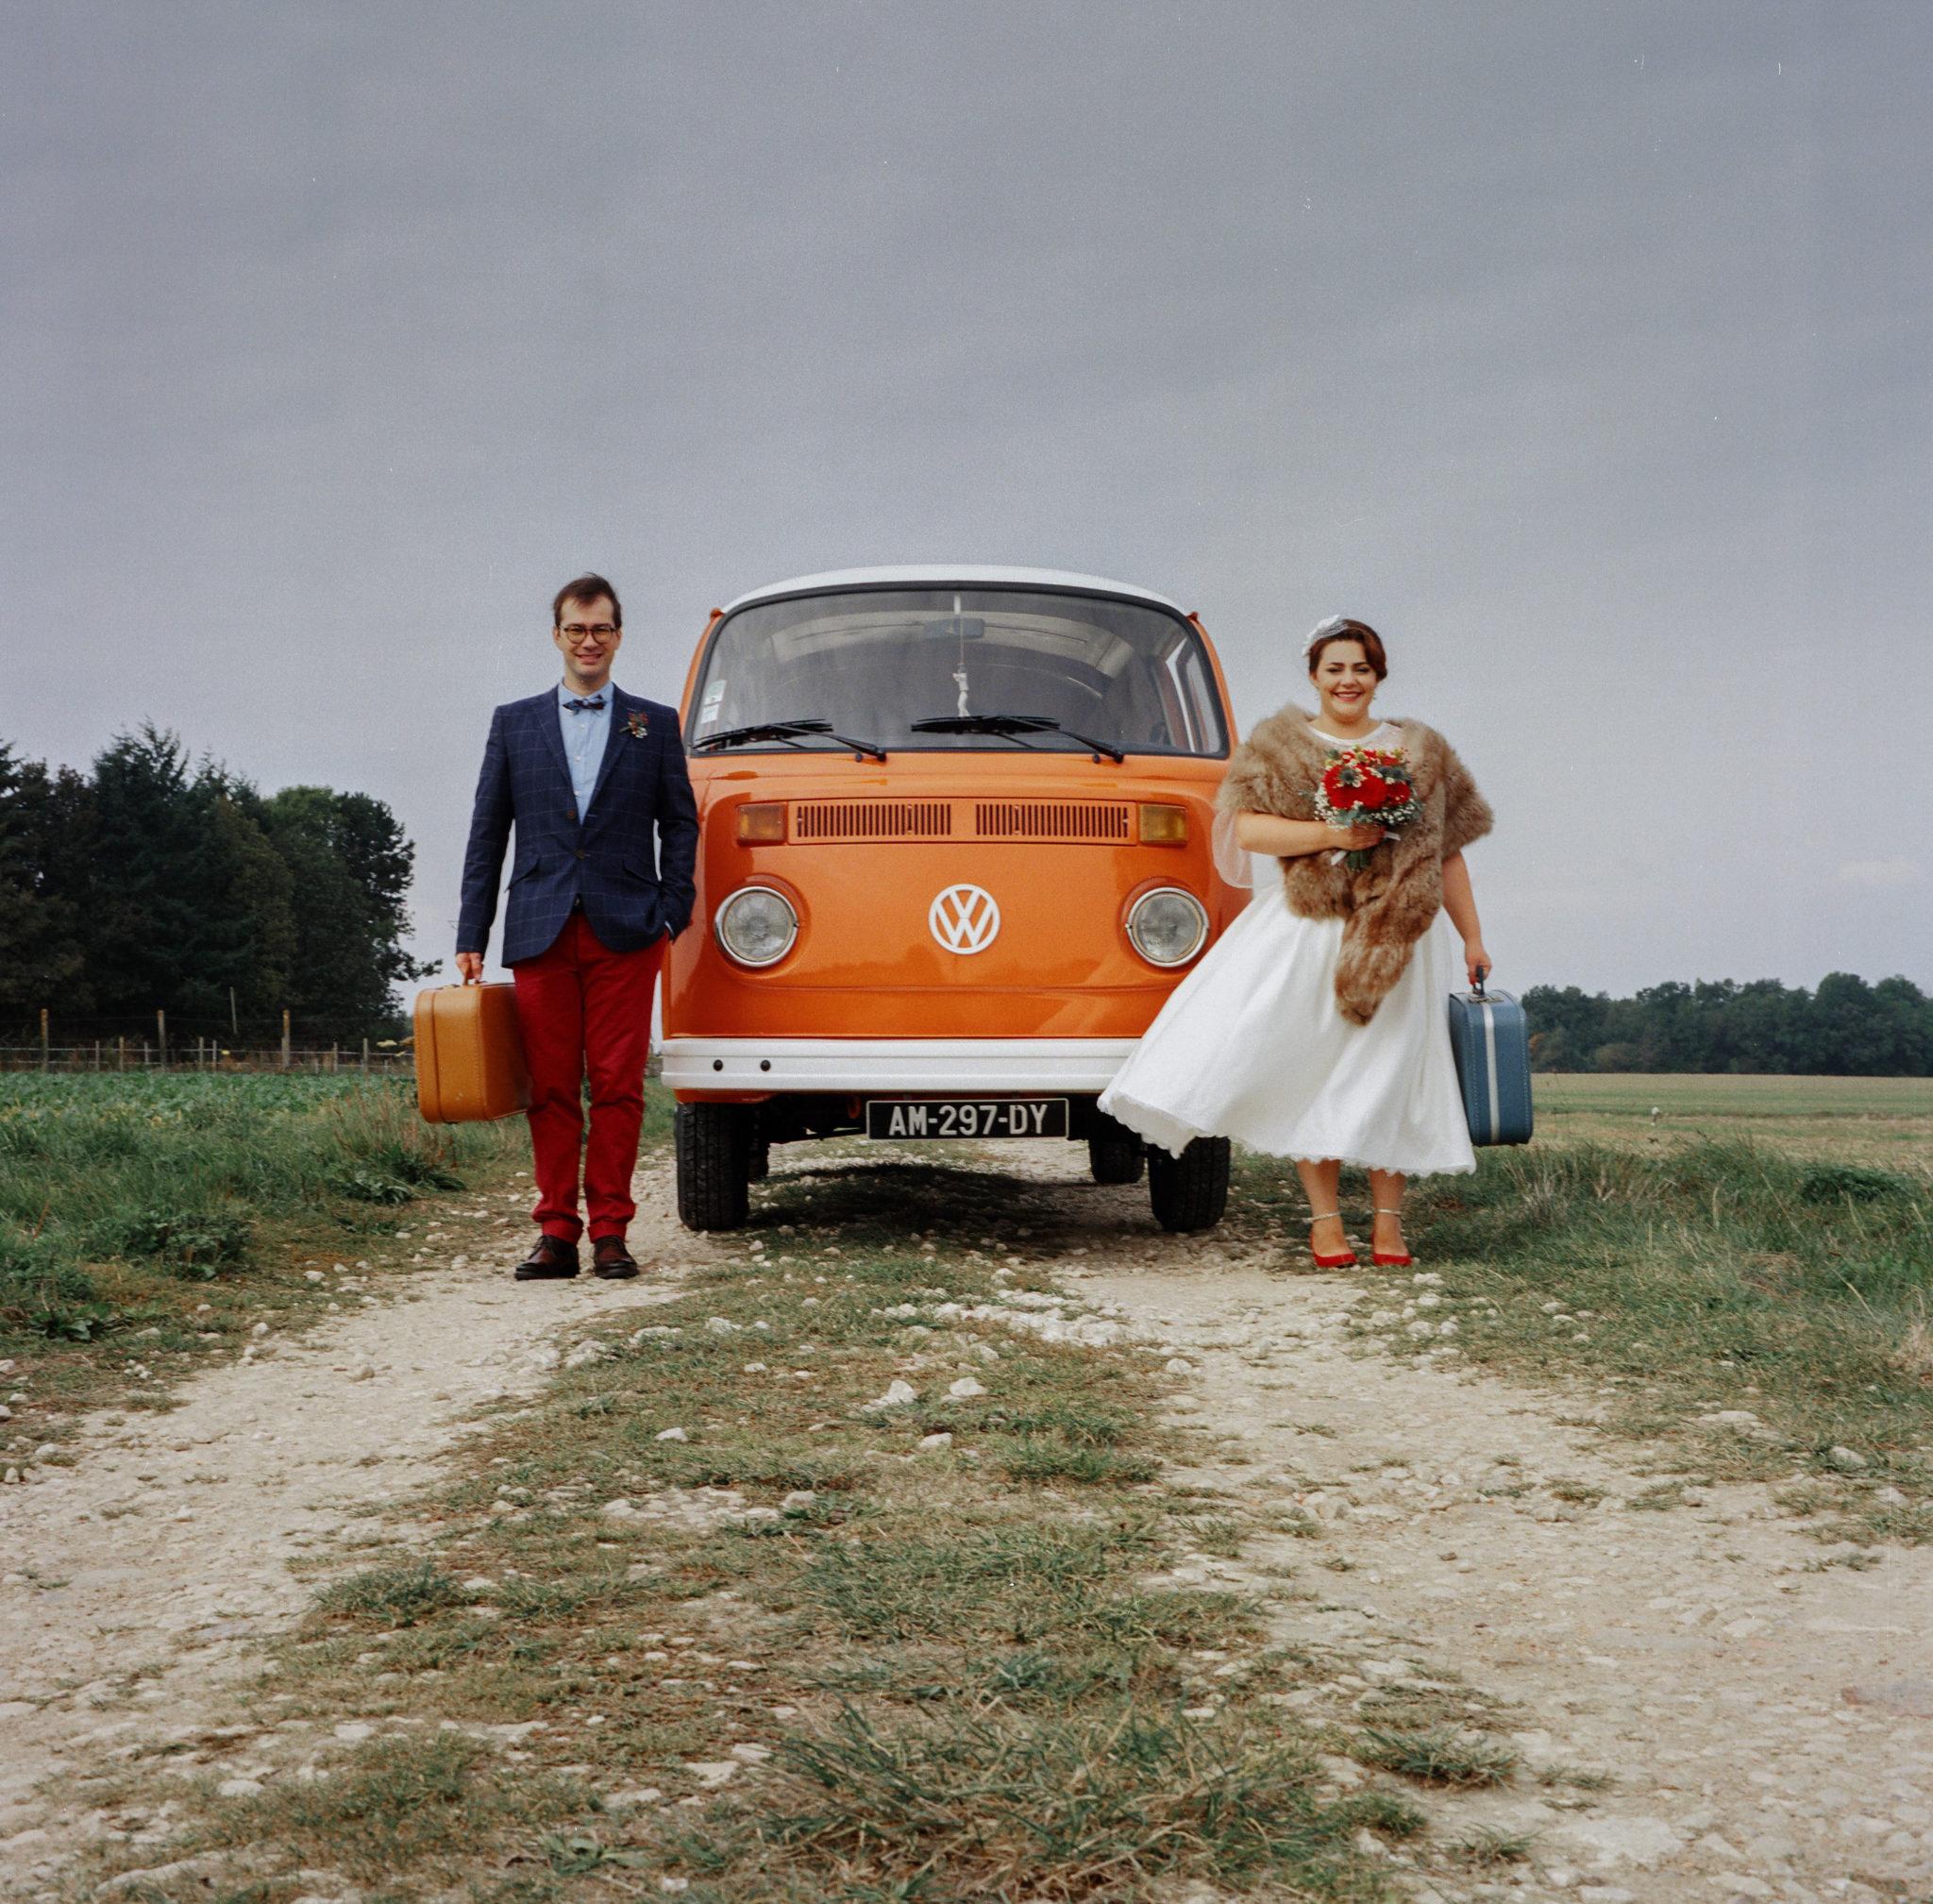 Portrait mariés champ combi vw volkswagen vintage orange Mariage 50s Domaine Mauvoisin Lommoye